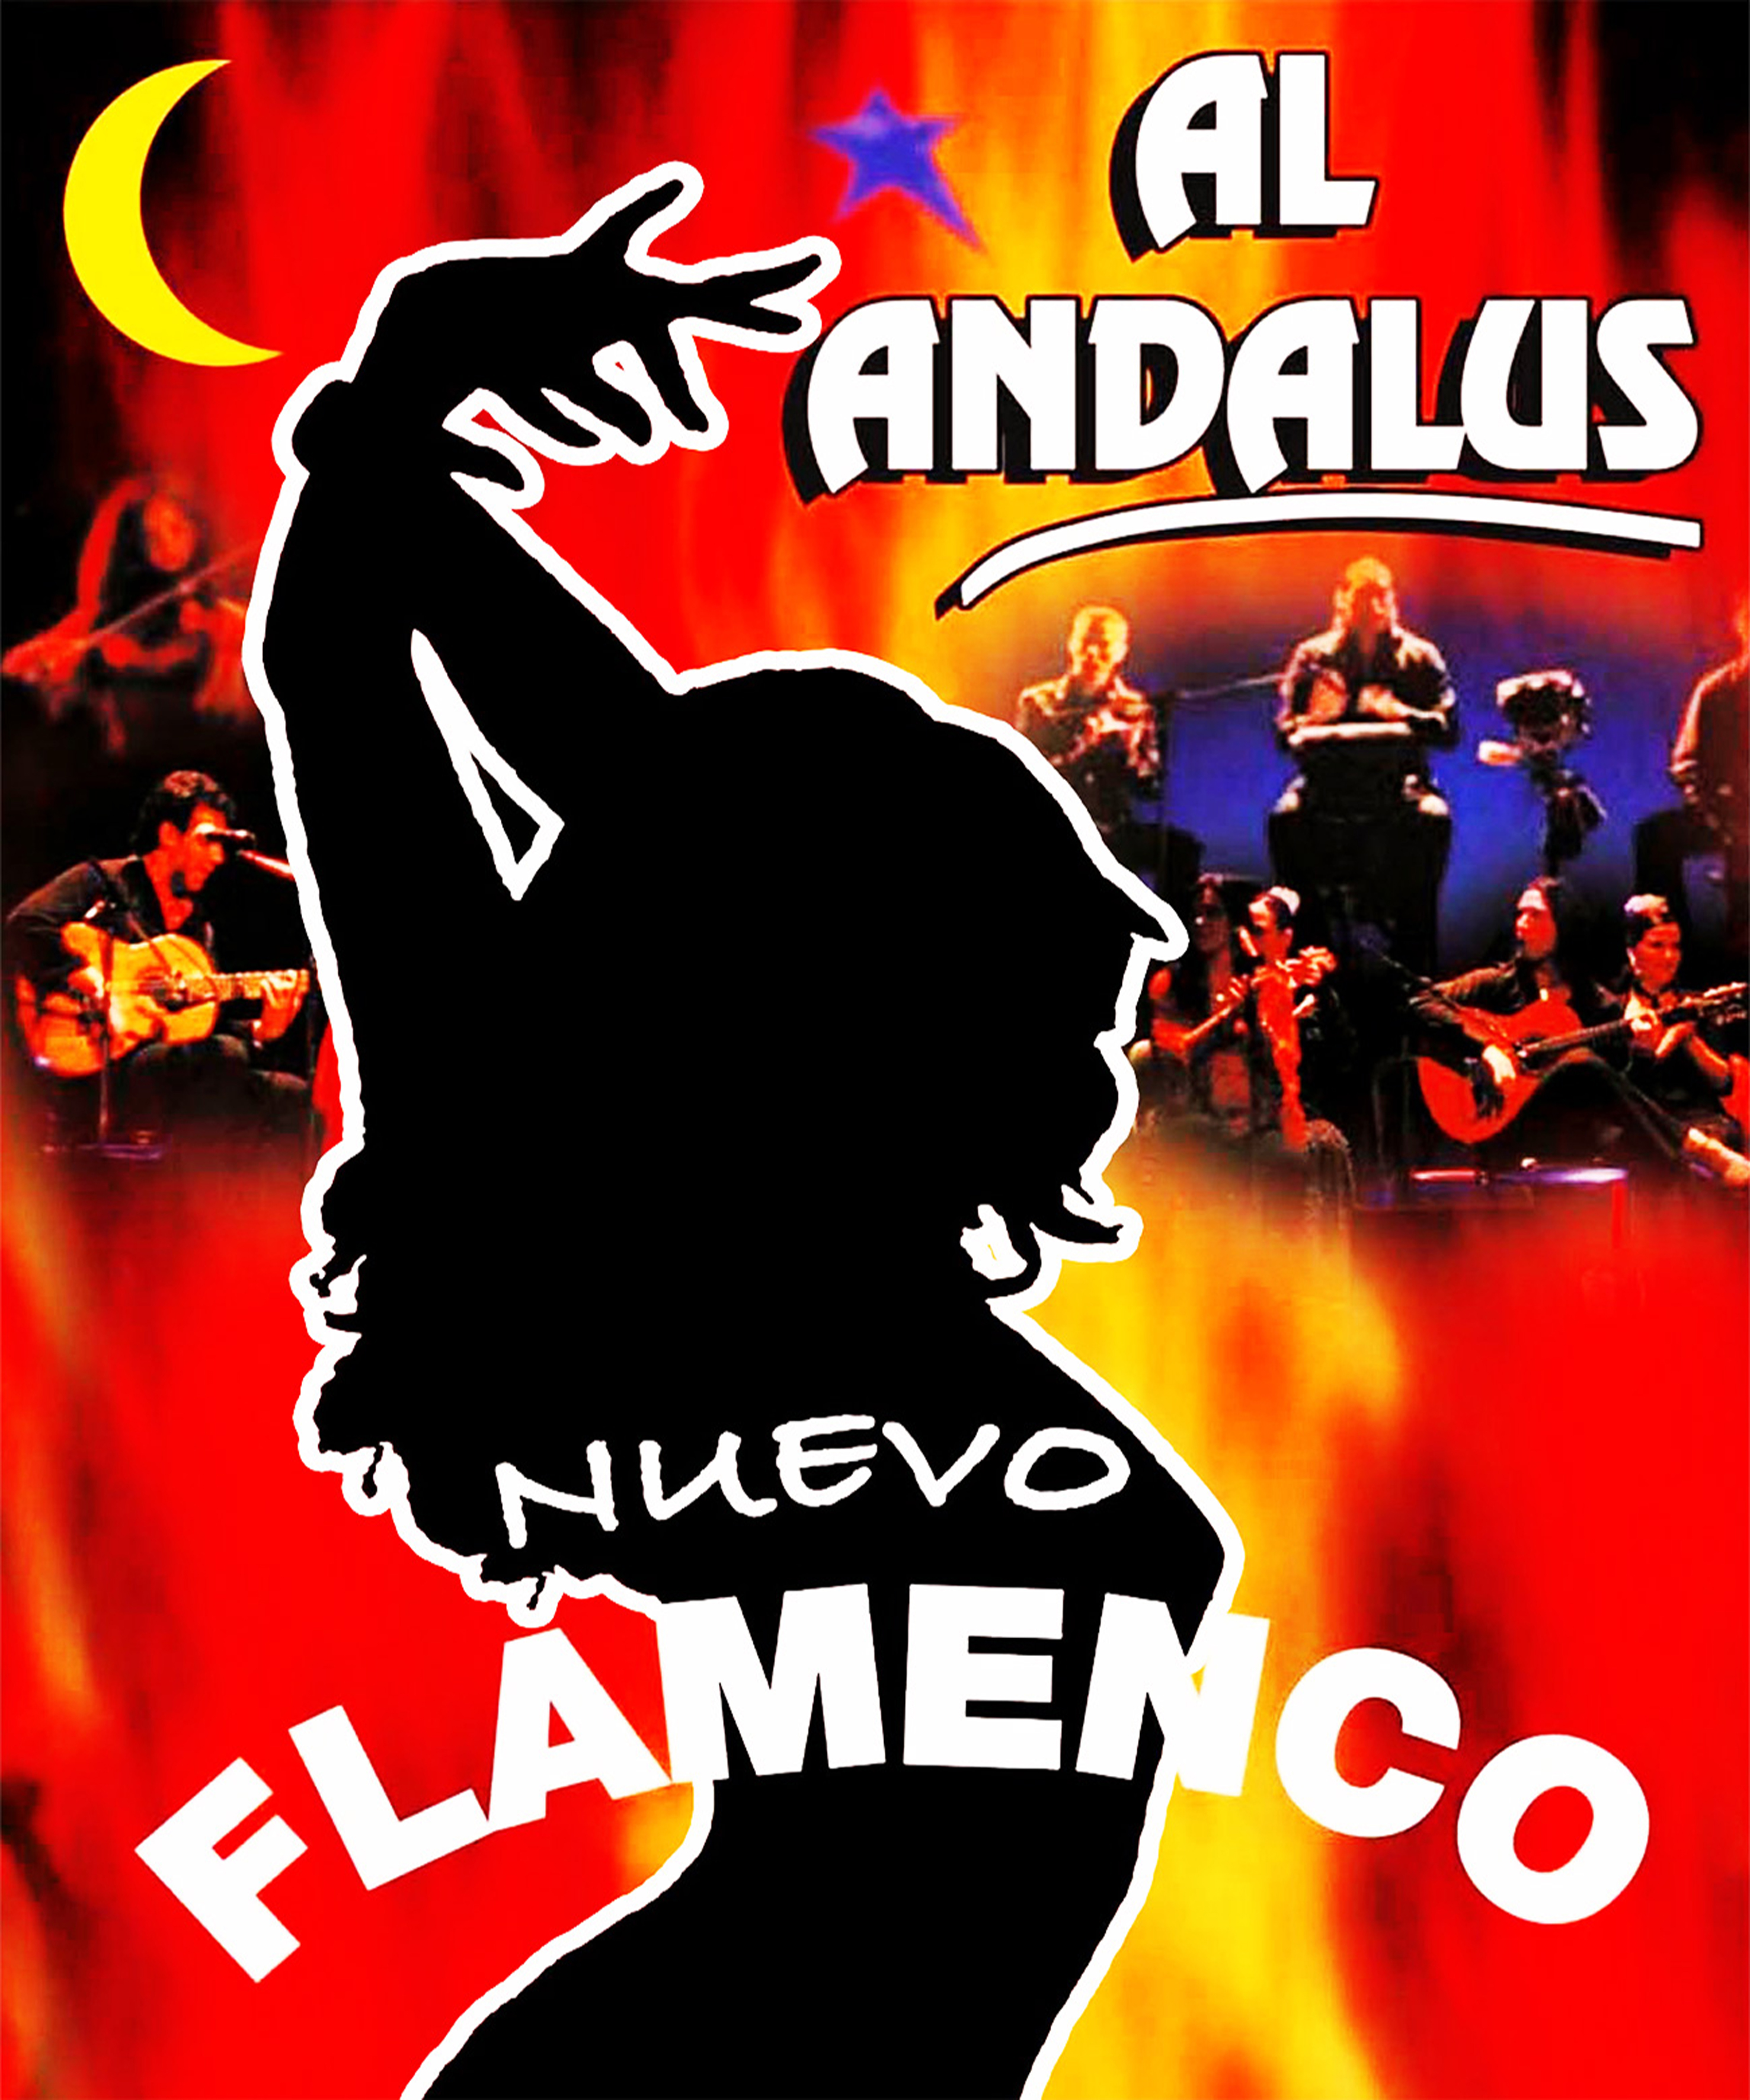 Al Andalus Flamenco Nuevo (2)